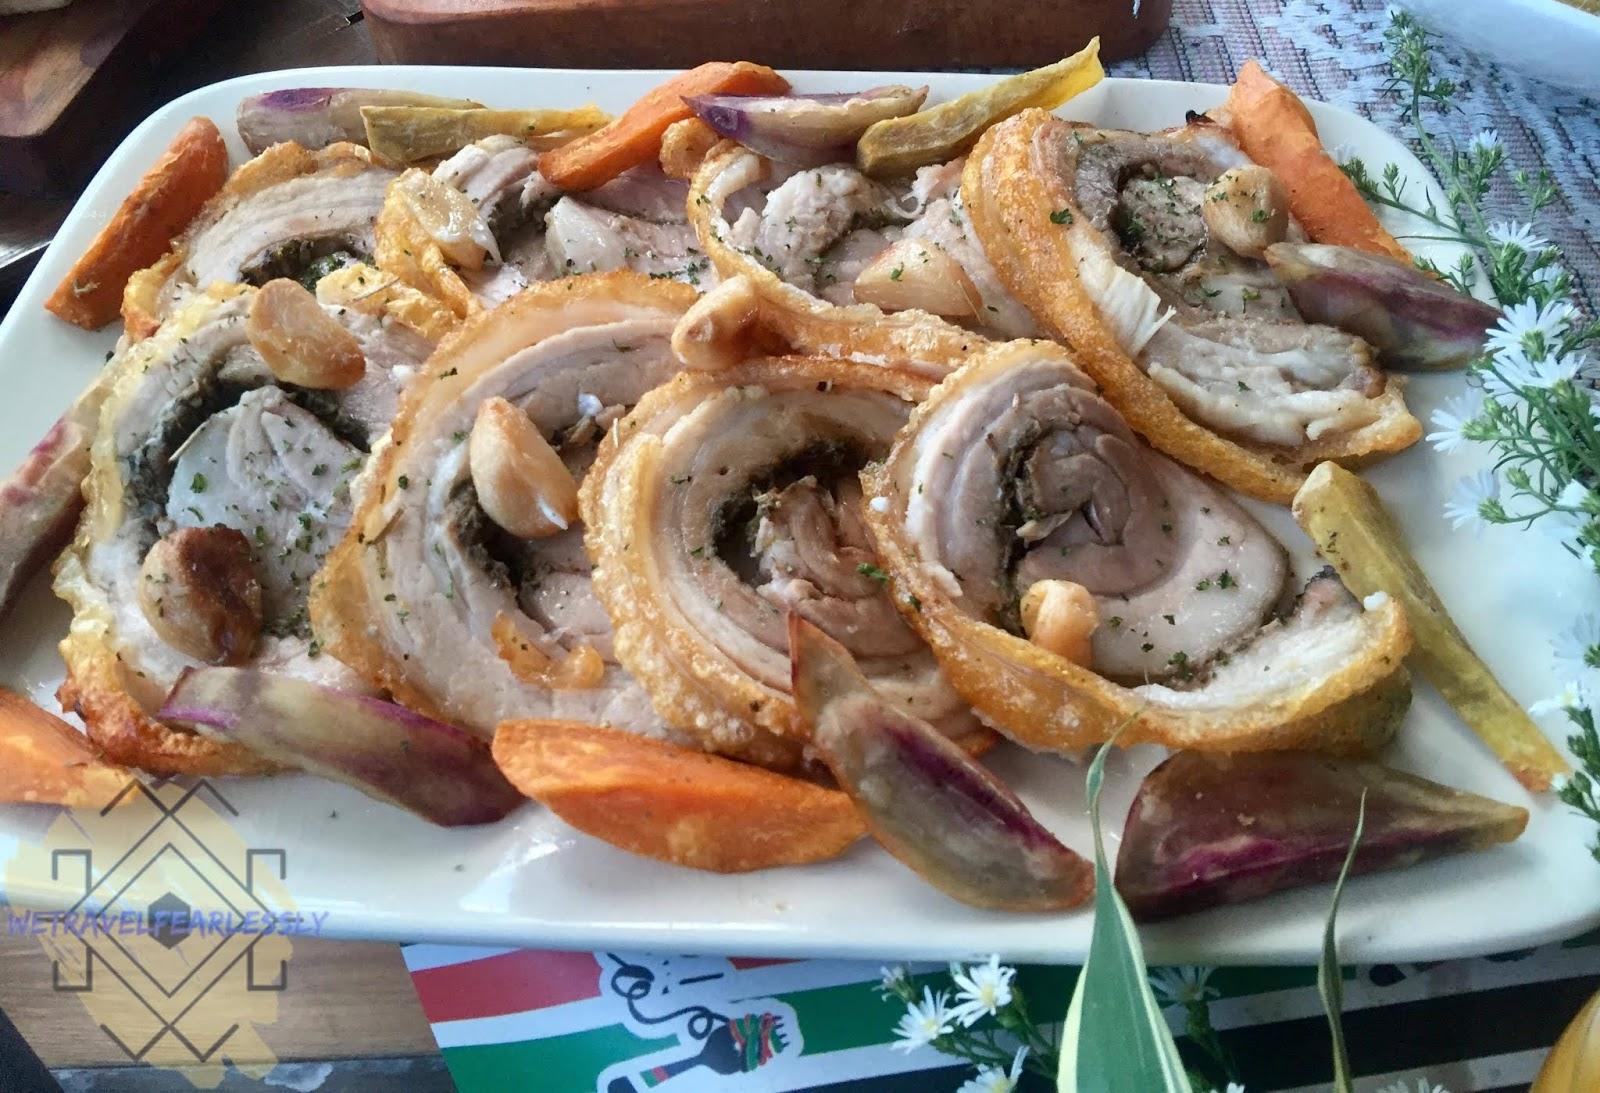 Porchetta (PHP780) in Cucina di Francesco in Libis, Quezon City - WTF Review